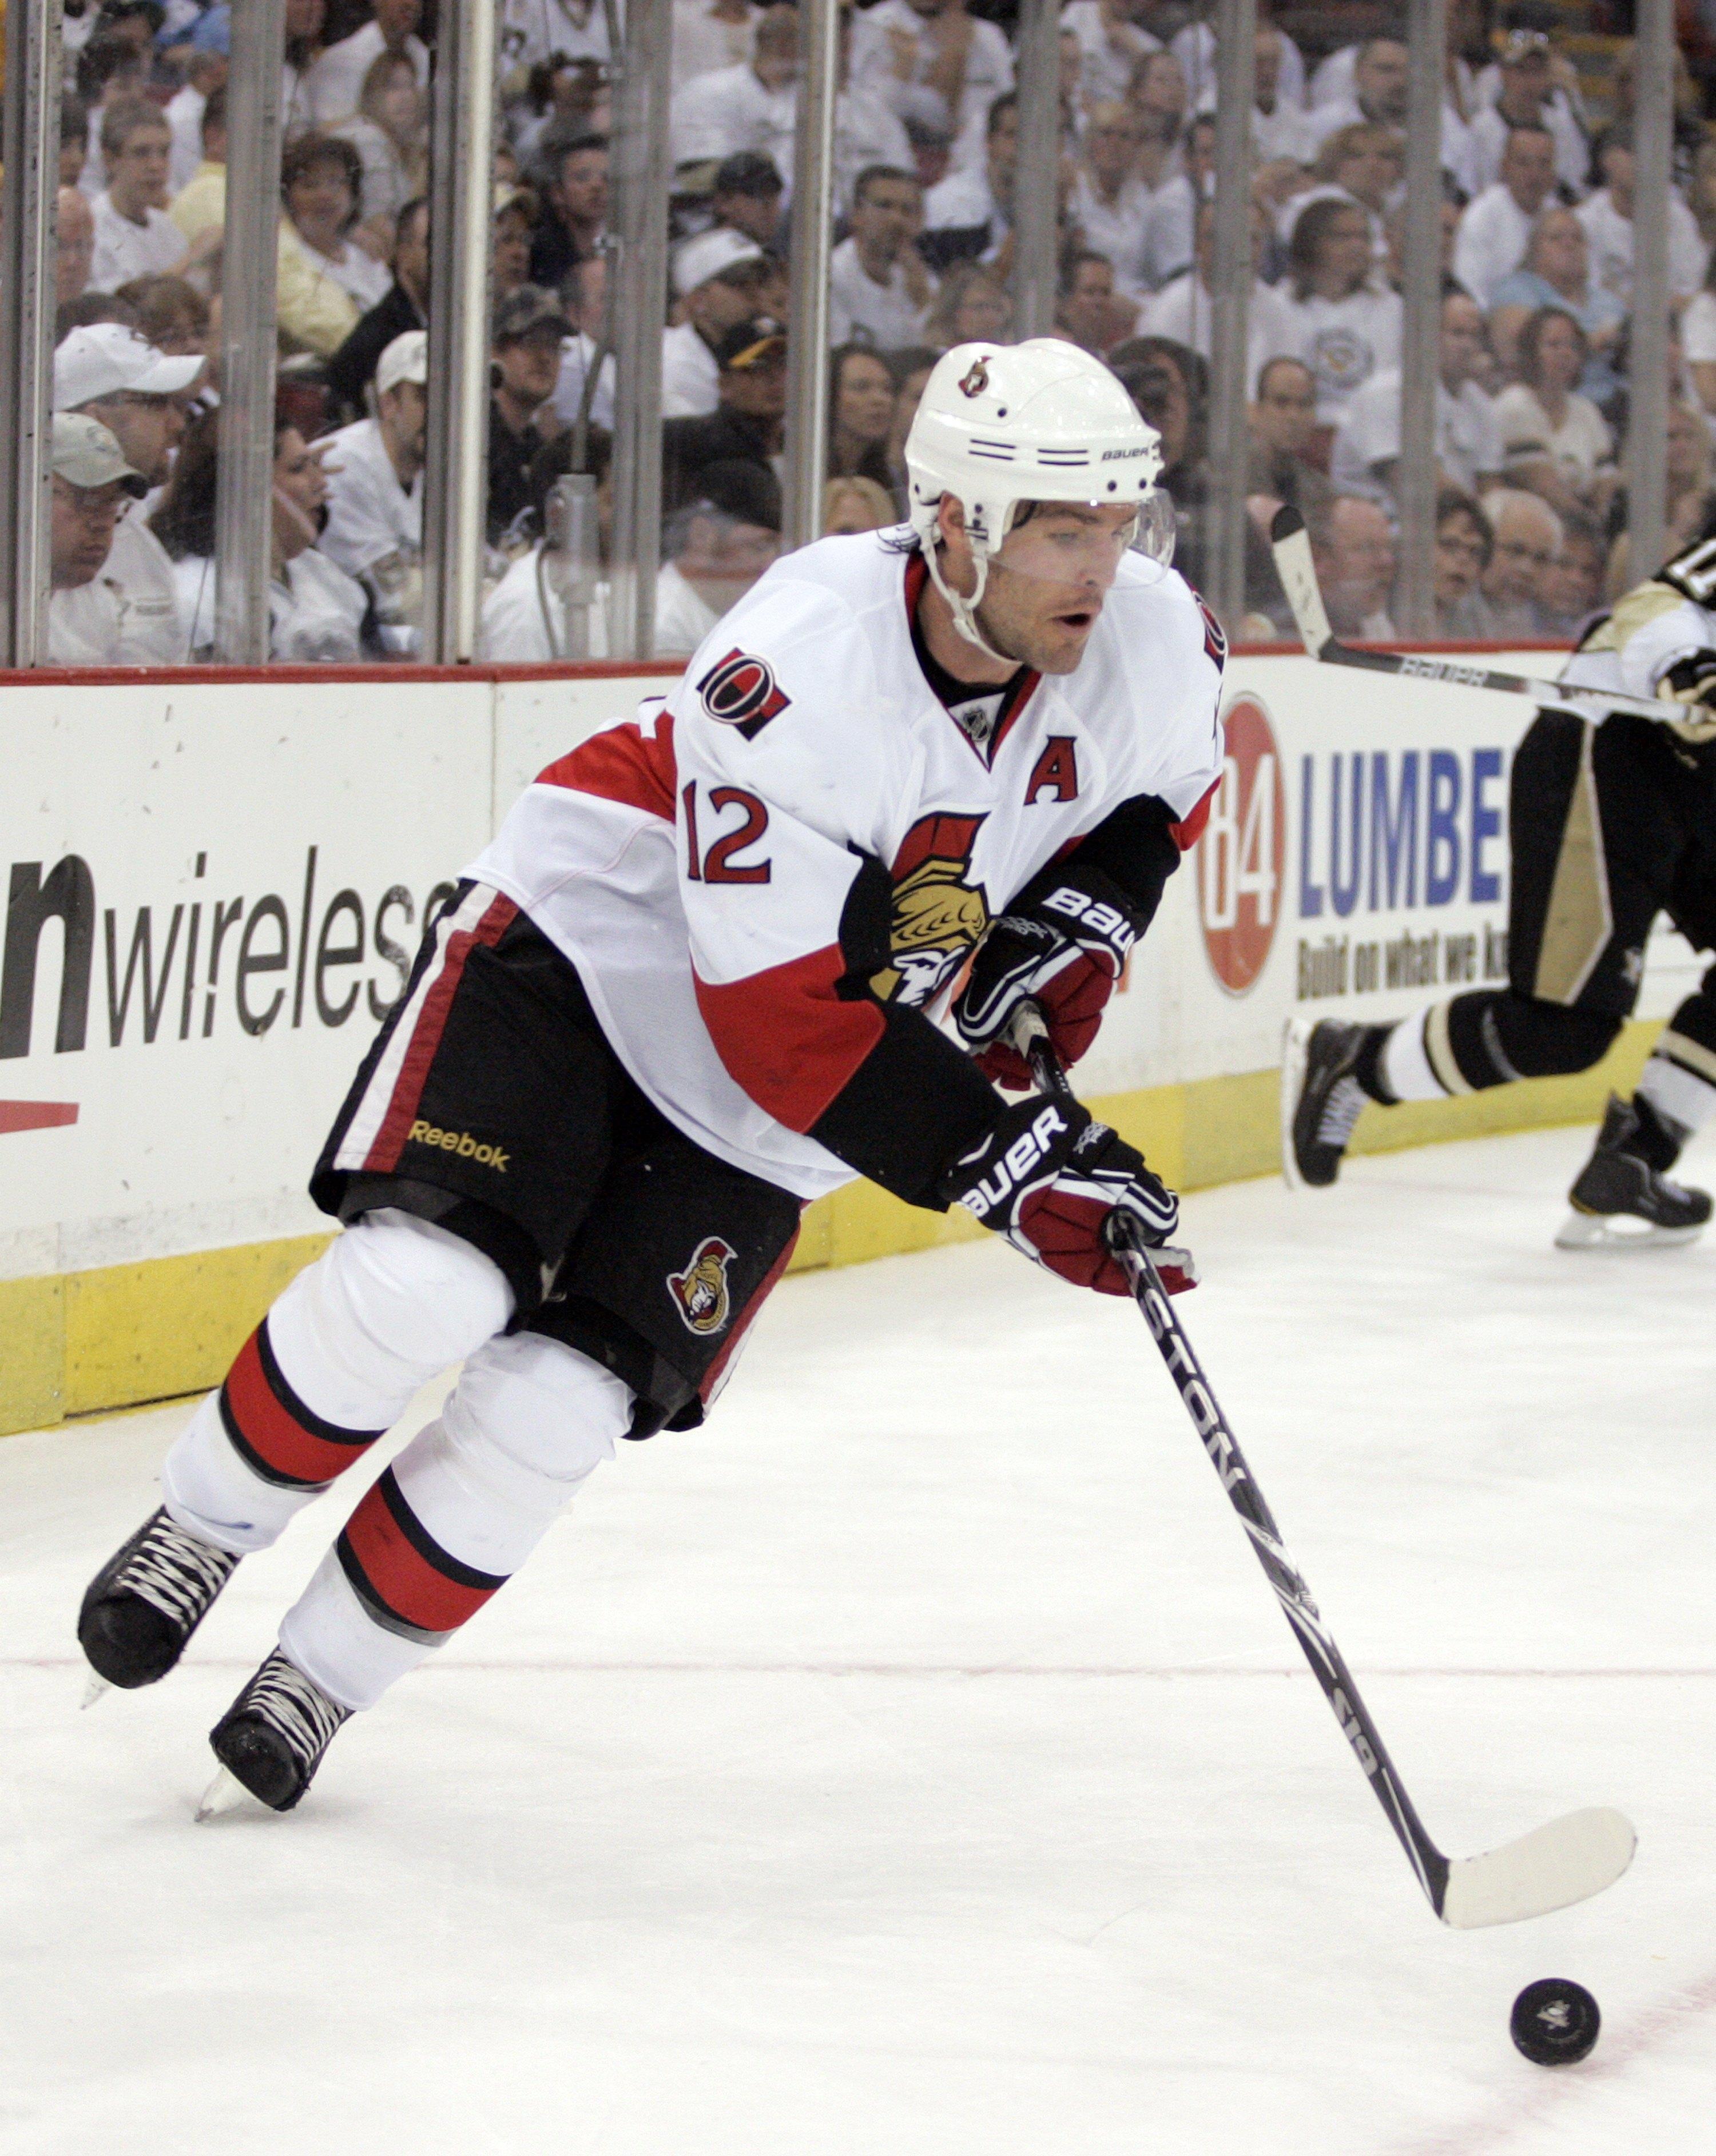 41ac6d67 PITTSBURGH - APRIL 16: Mike Fisher #12 of the Ottawa Senators handles the  puck